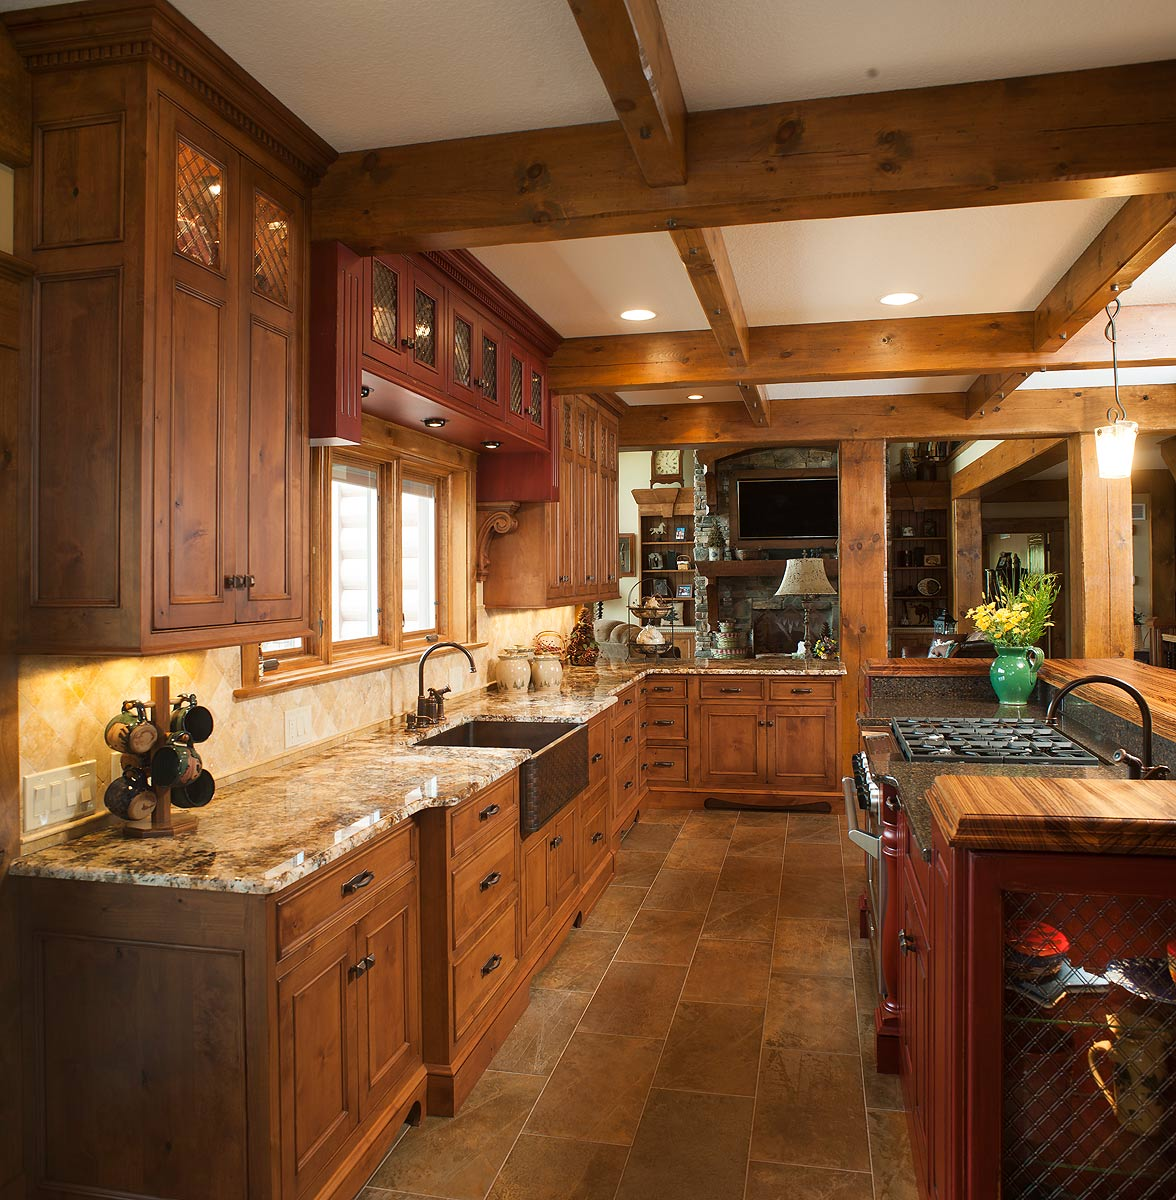 Mullet Cabinet Rustic Kitchen Retreat